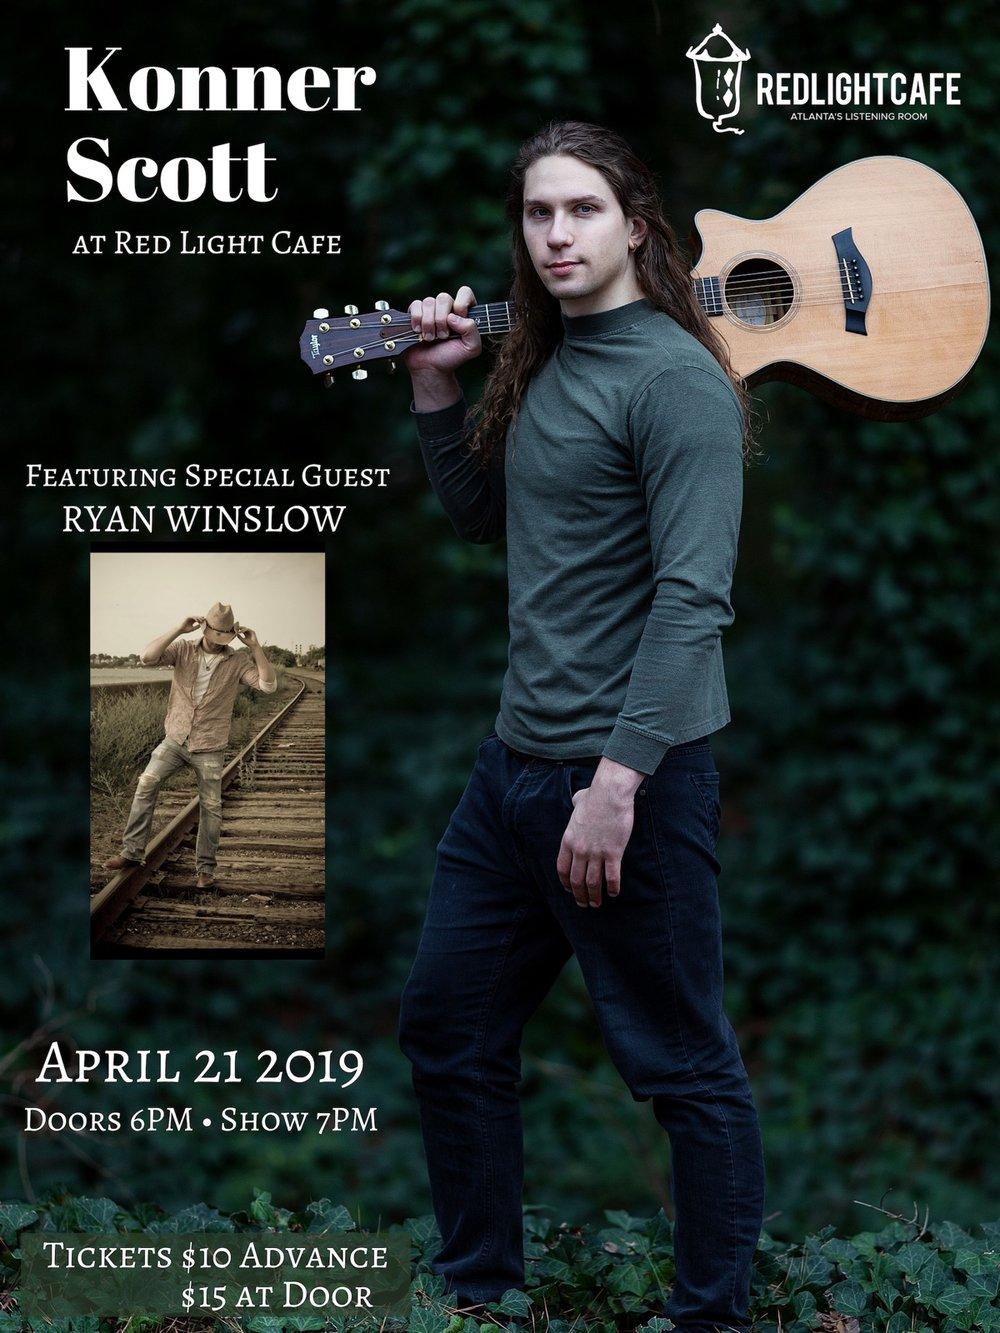 Konner Scott w/ special guest Ryan Winslow — April 21, 2019 — Red Light Café, Atlanta, GA